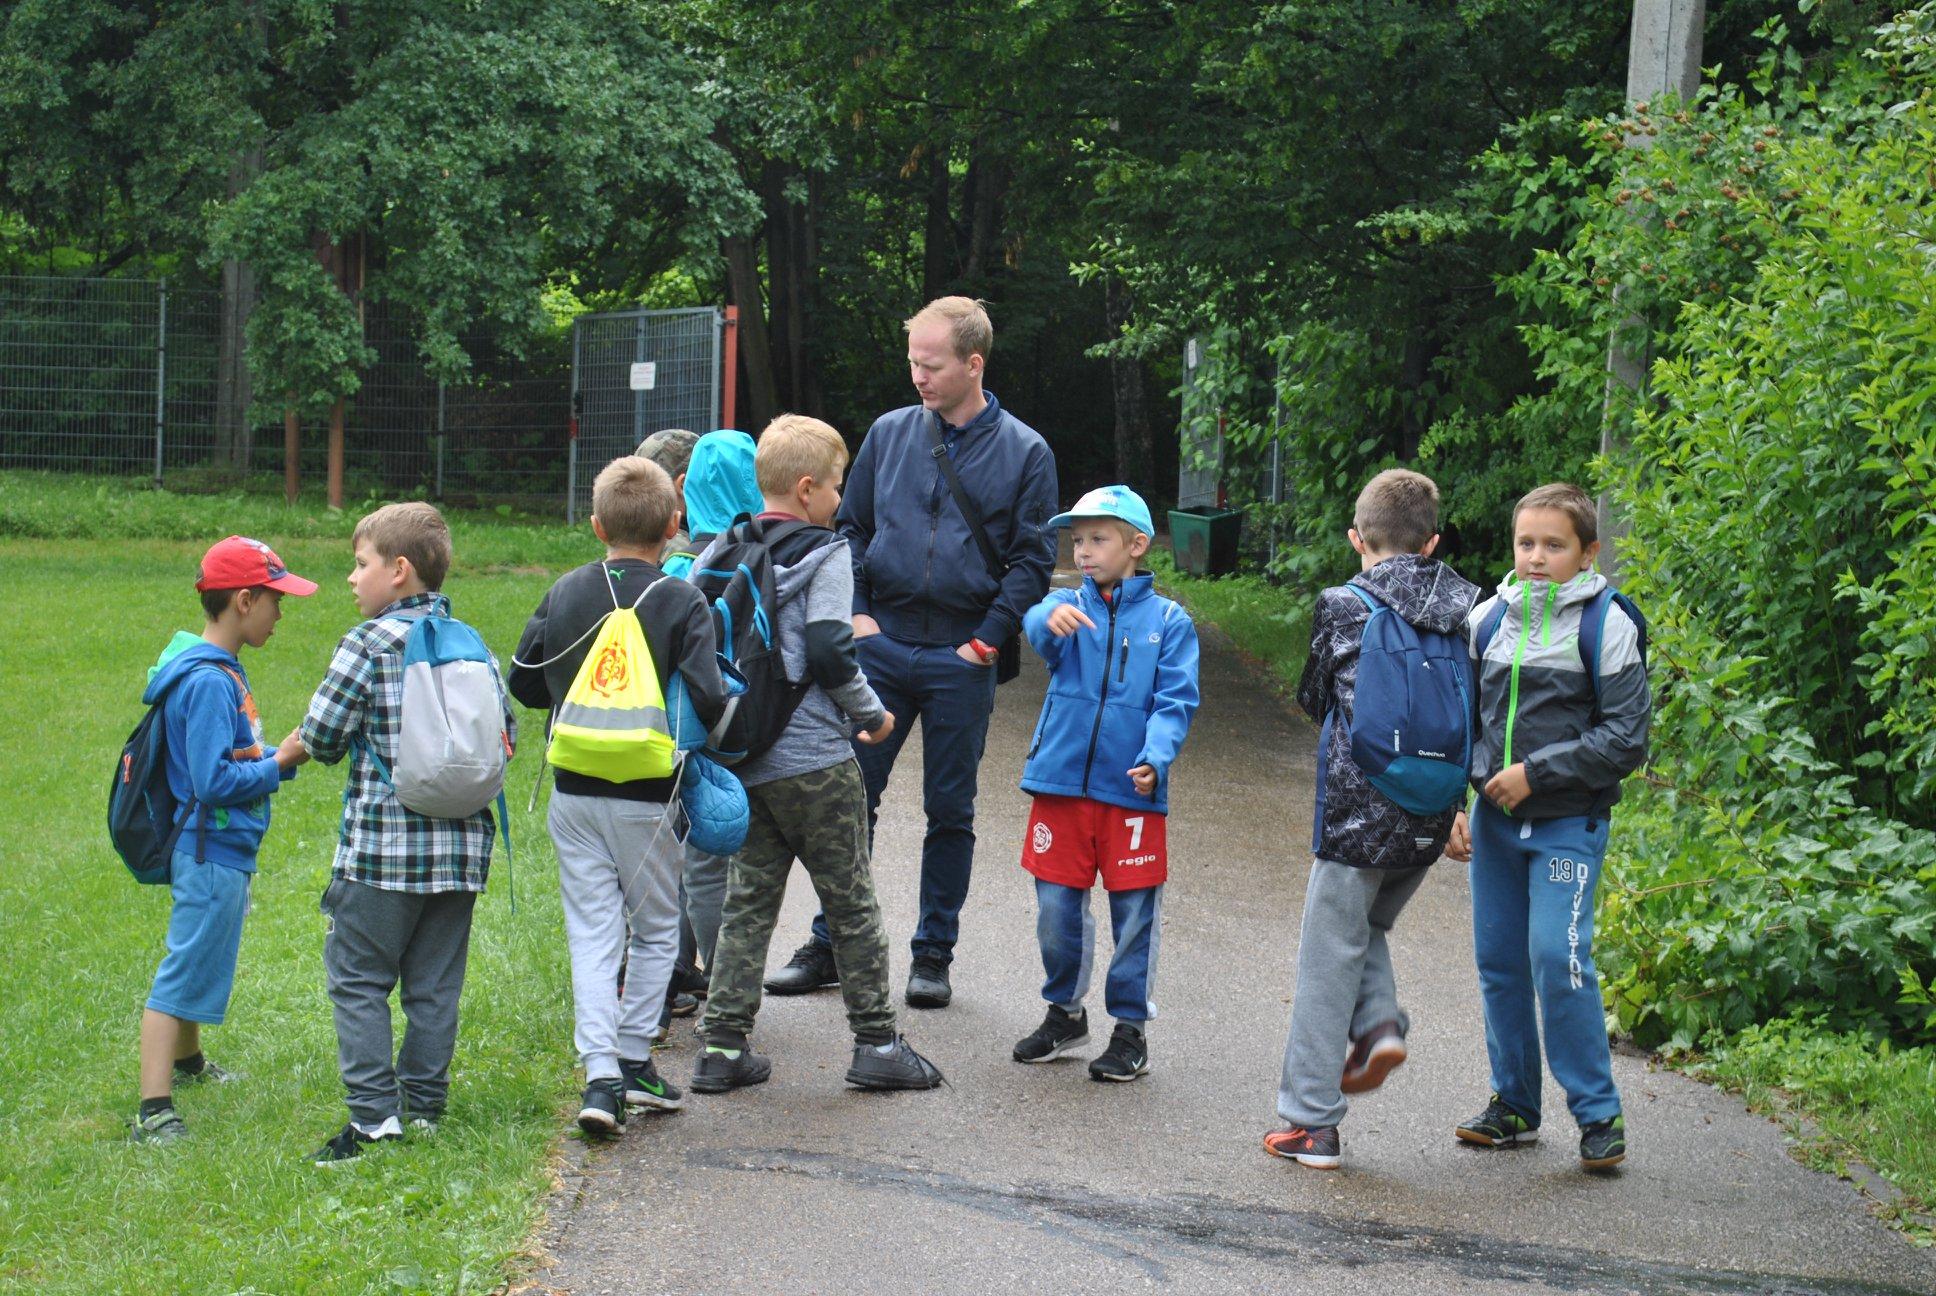 dzieci wraz z opiekunem - panem Sebastianem Urbasiem